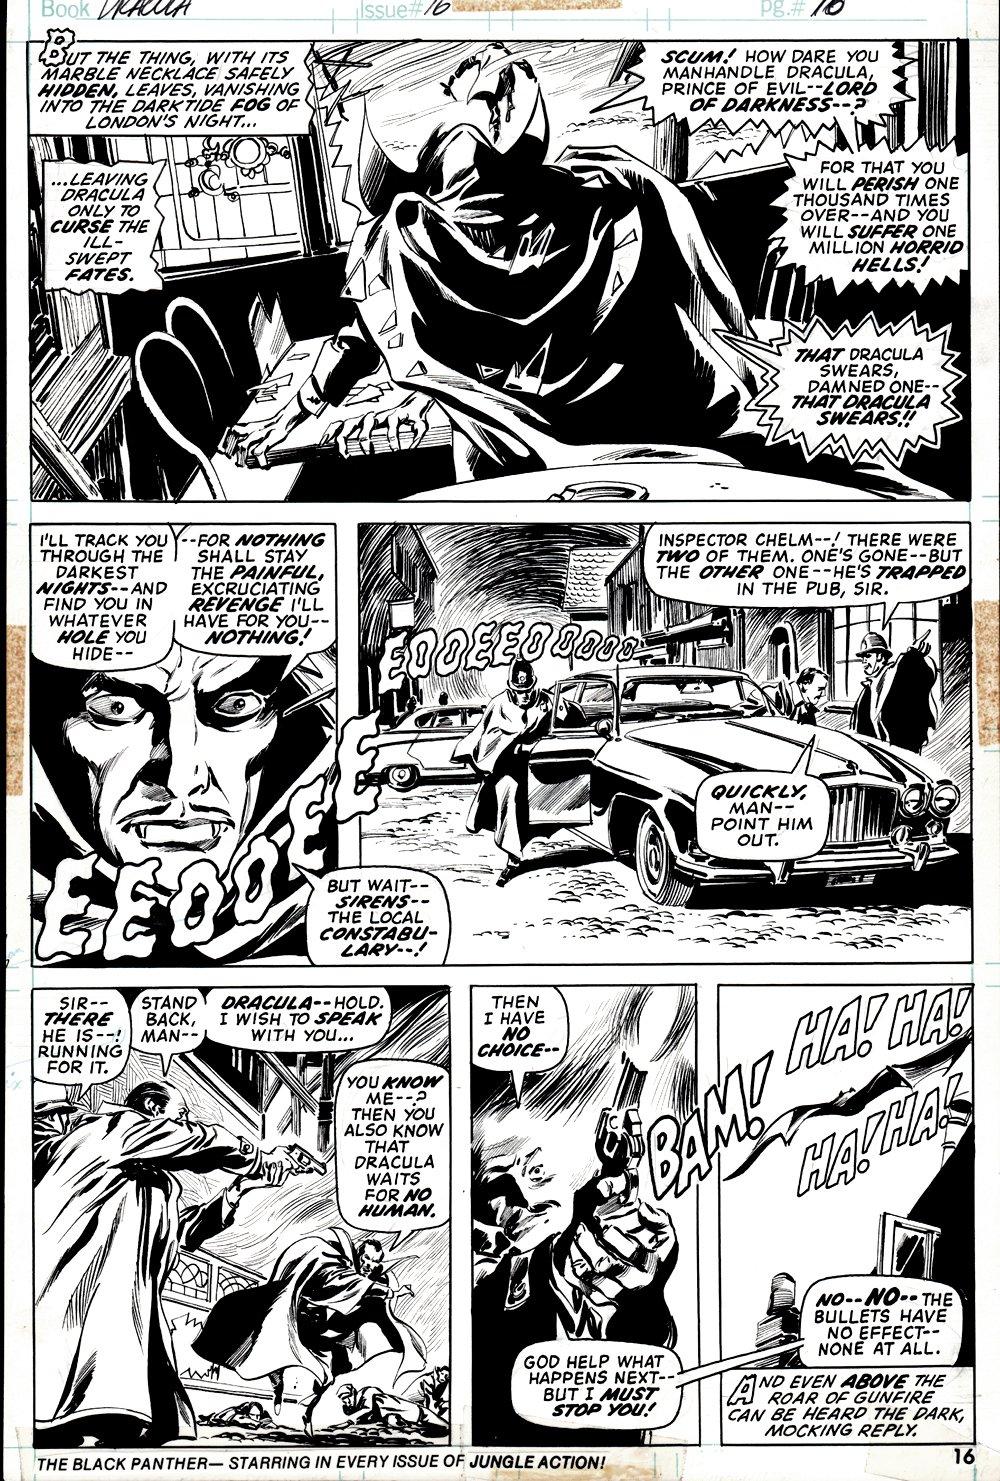 Tomb of Dracula #16 p 16 (DRACULA BATTLE PAGE!) 1973